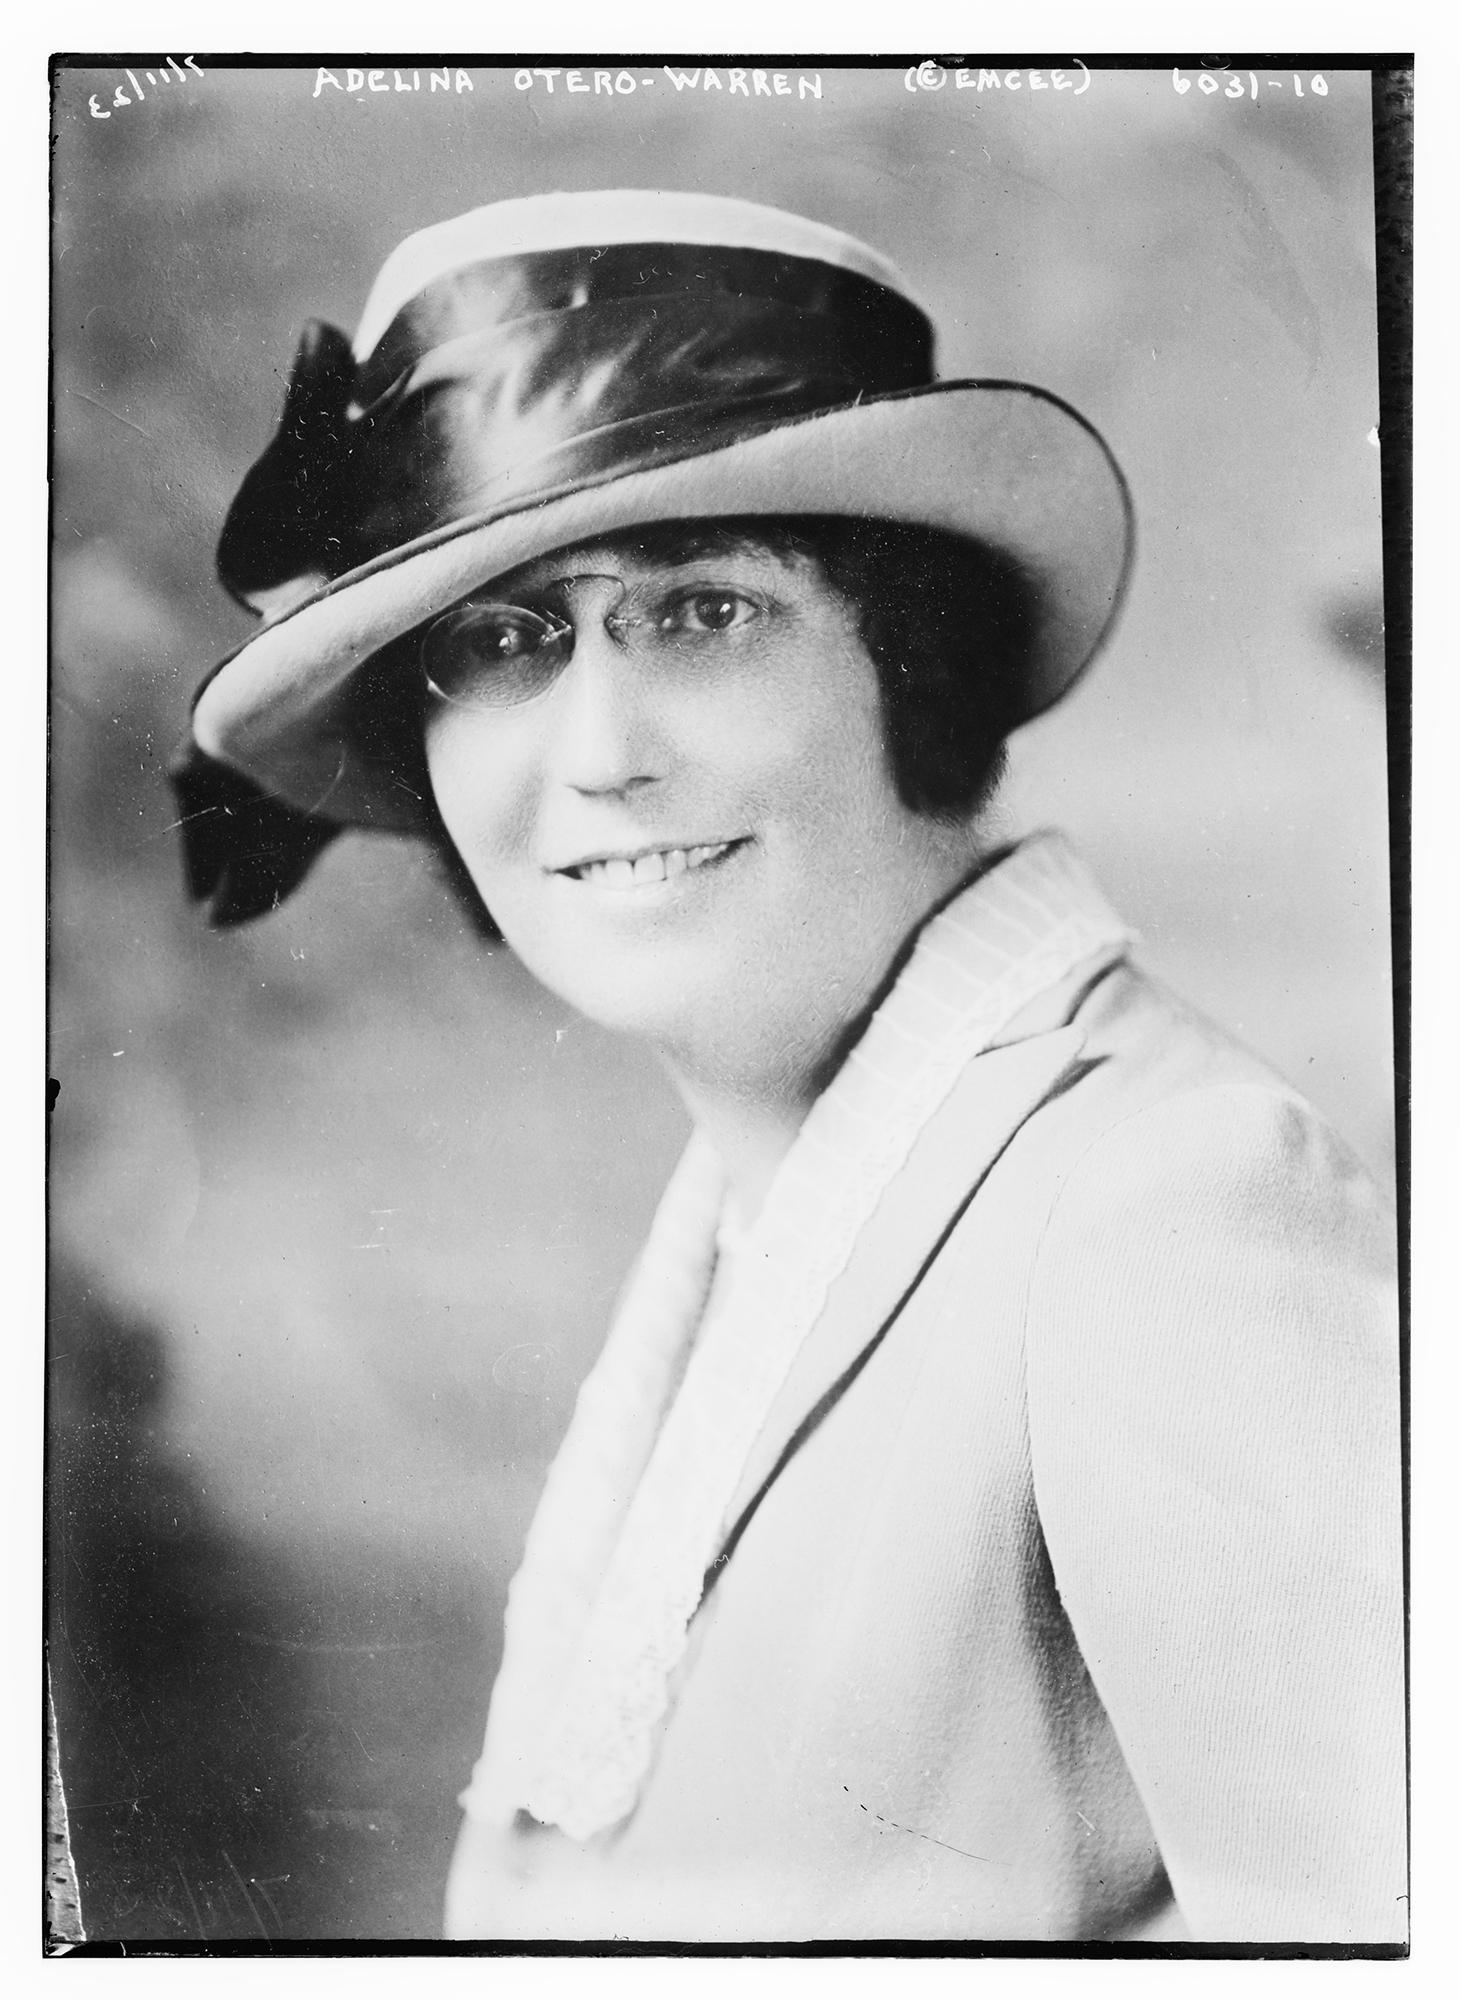 A 1923 photo of New Mexico suffragist Nina Otero-Warren, who lobbied her state's legislators to ratify the 19th Amendment.